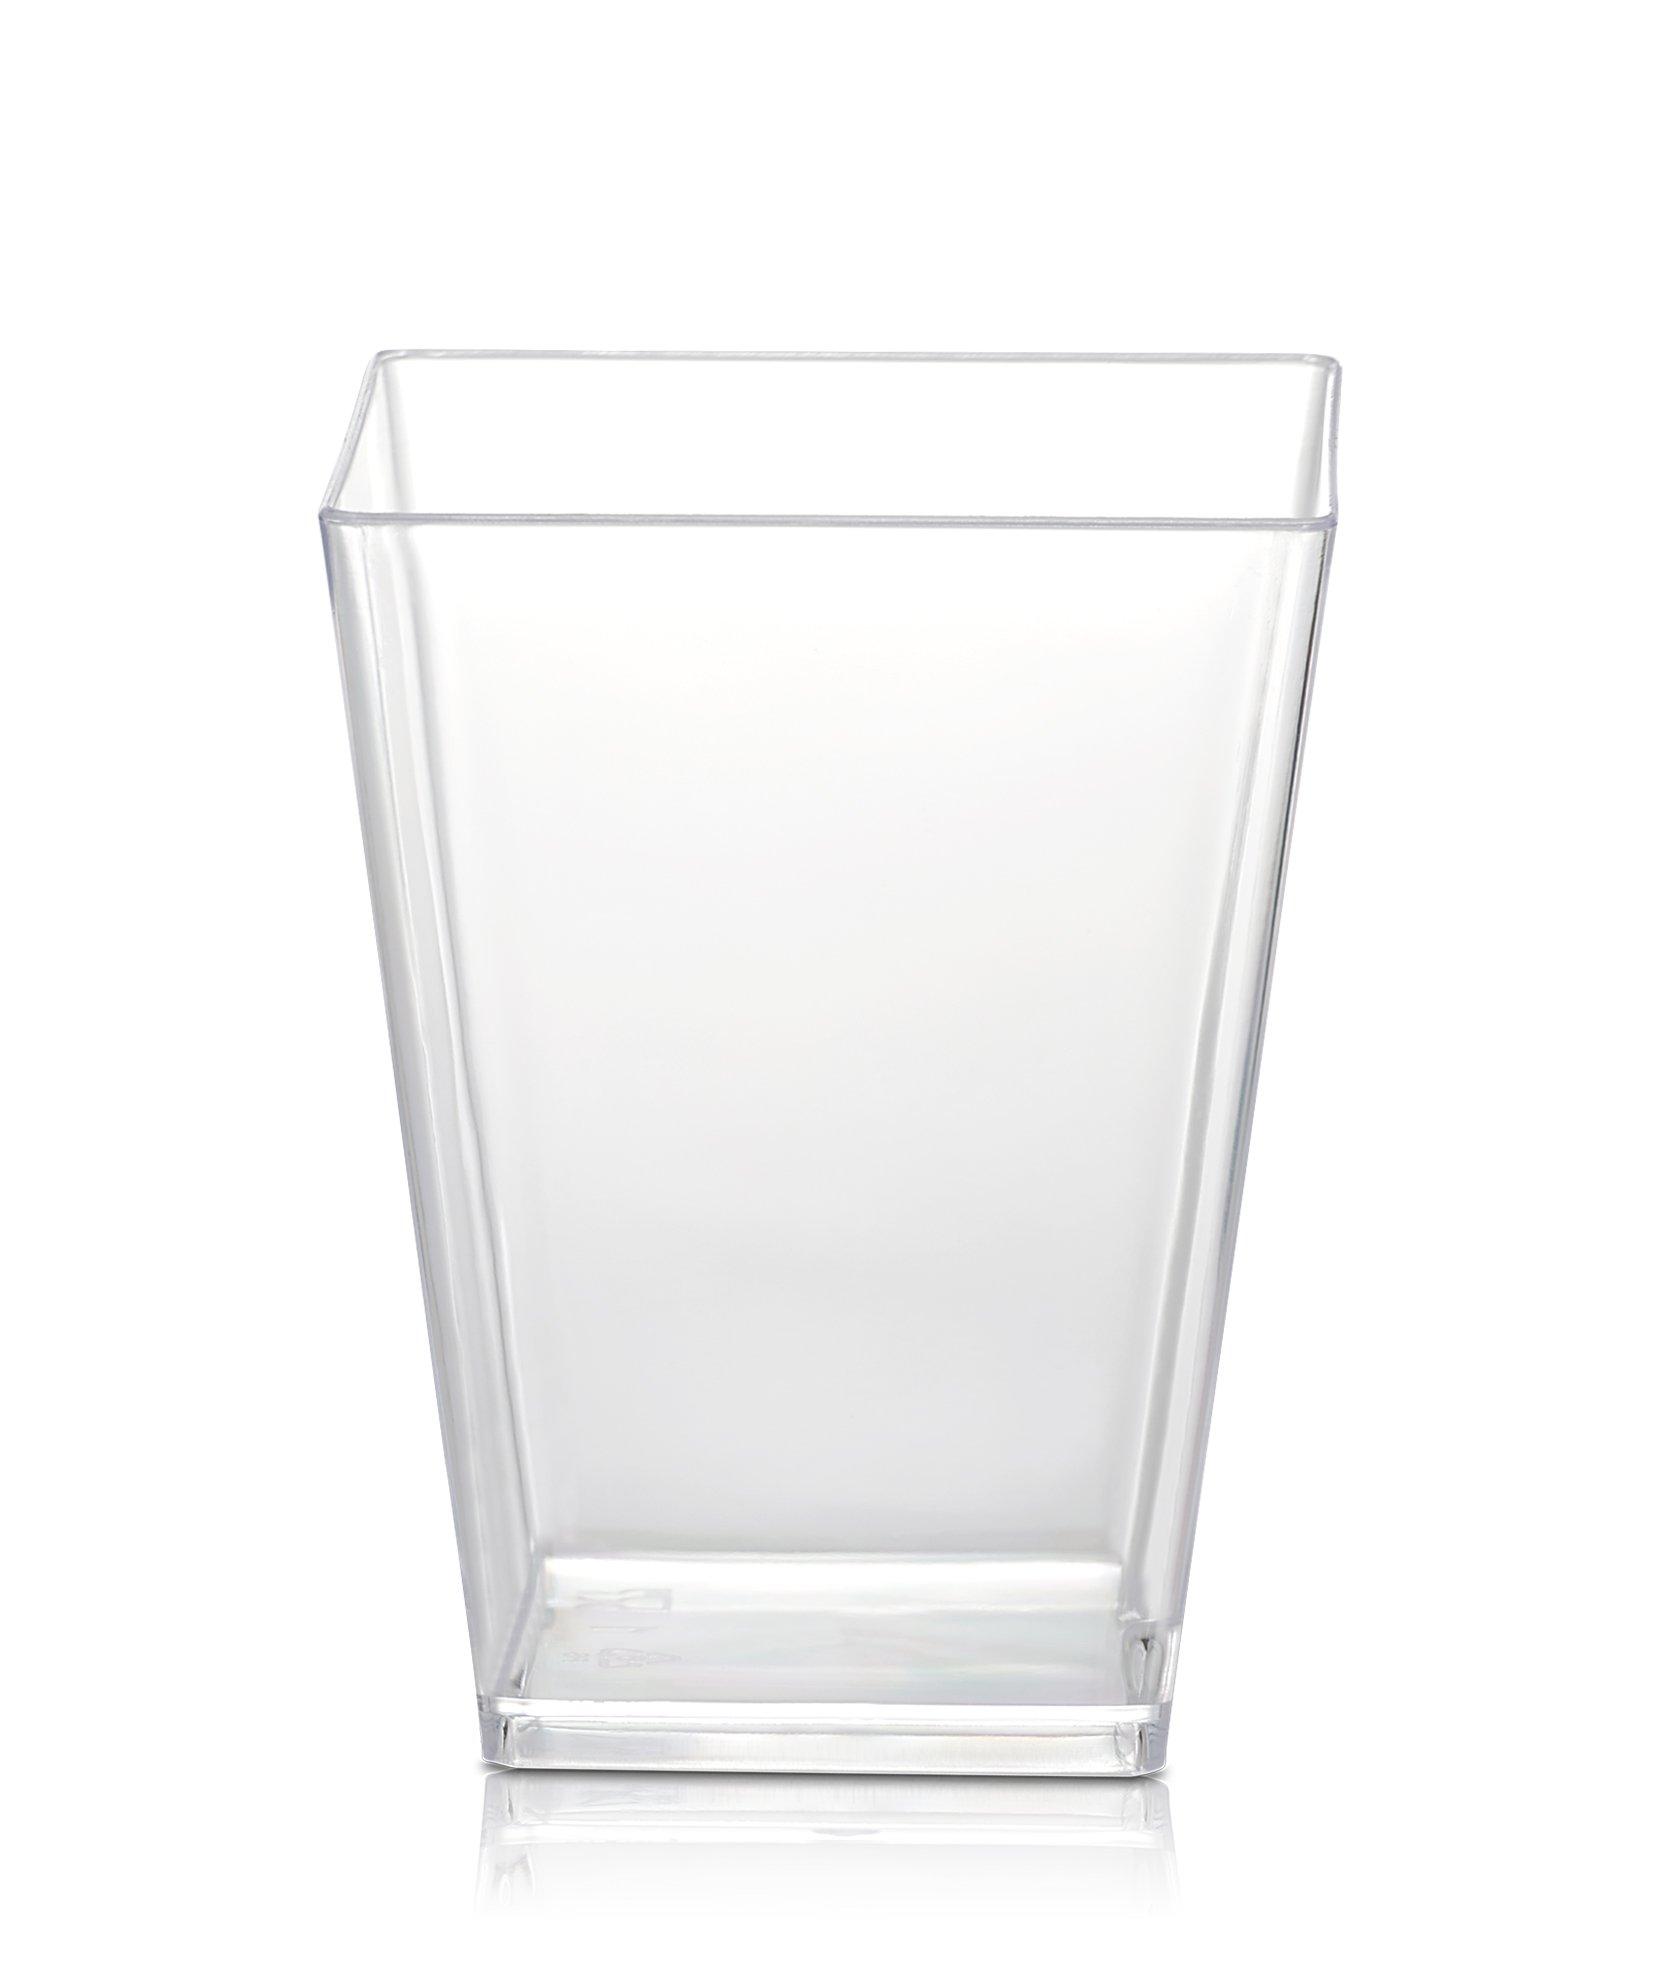 50 Plastic Party Cups for Dessert 5.4 oz - Serve Tiramisu, Parfait, Dip, Sundaes, Single Serve Desserts and More - Clear Plastic Tumbler Glasses - Mini Appetizer Dish or Square Bowl - by SticFigs